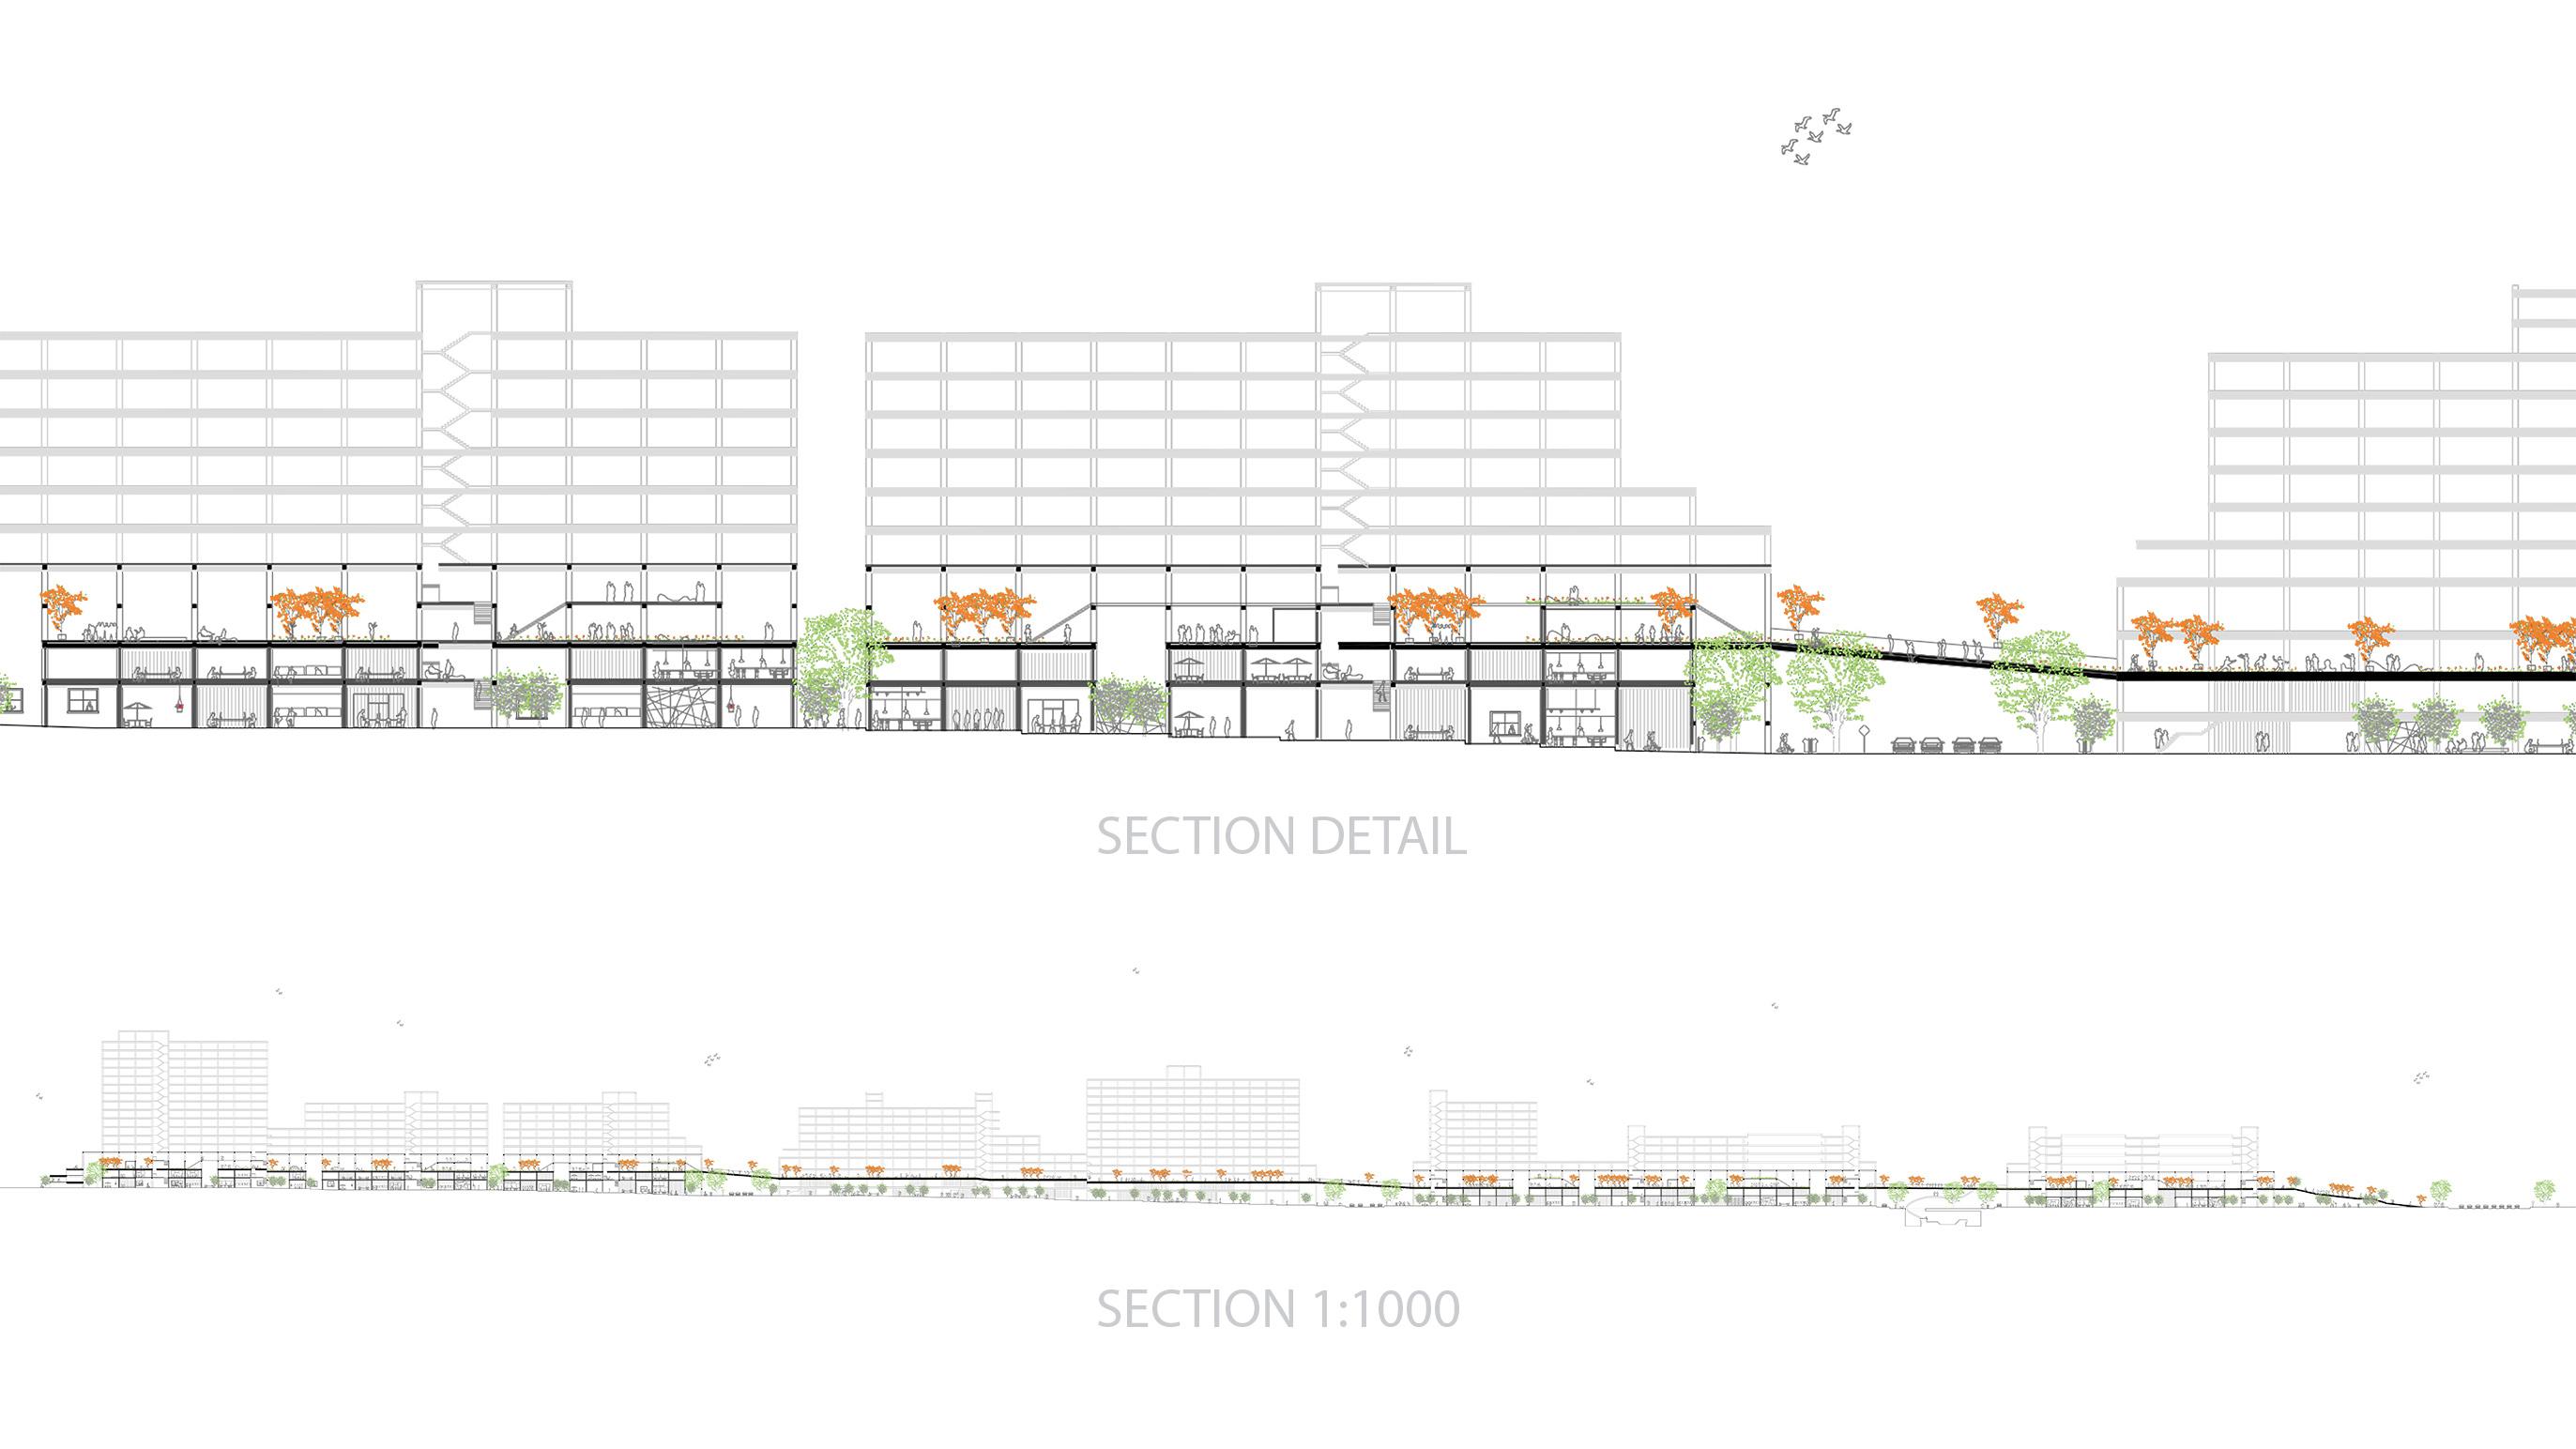 Seunsangga citywalk: Anhaltende Transformation